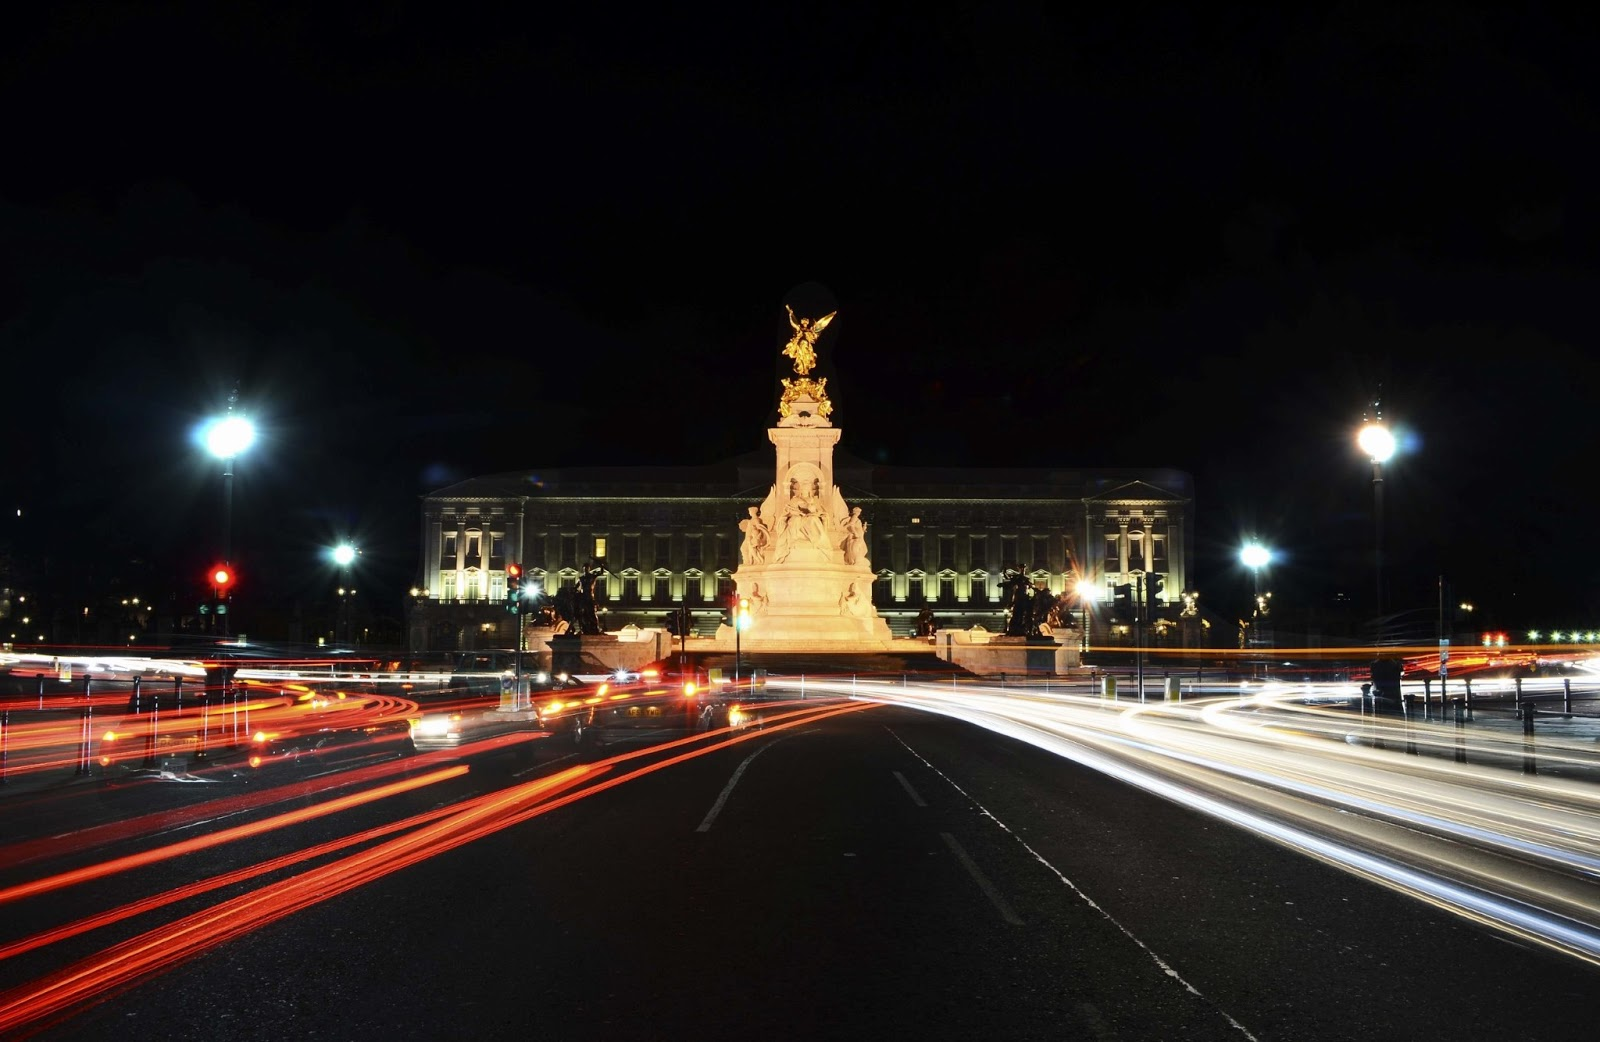 Buckingham Palace night view